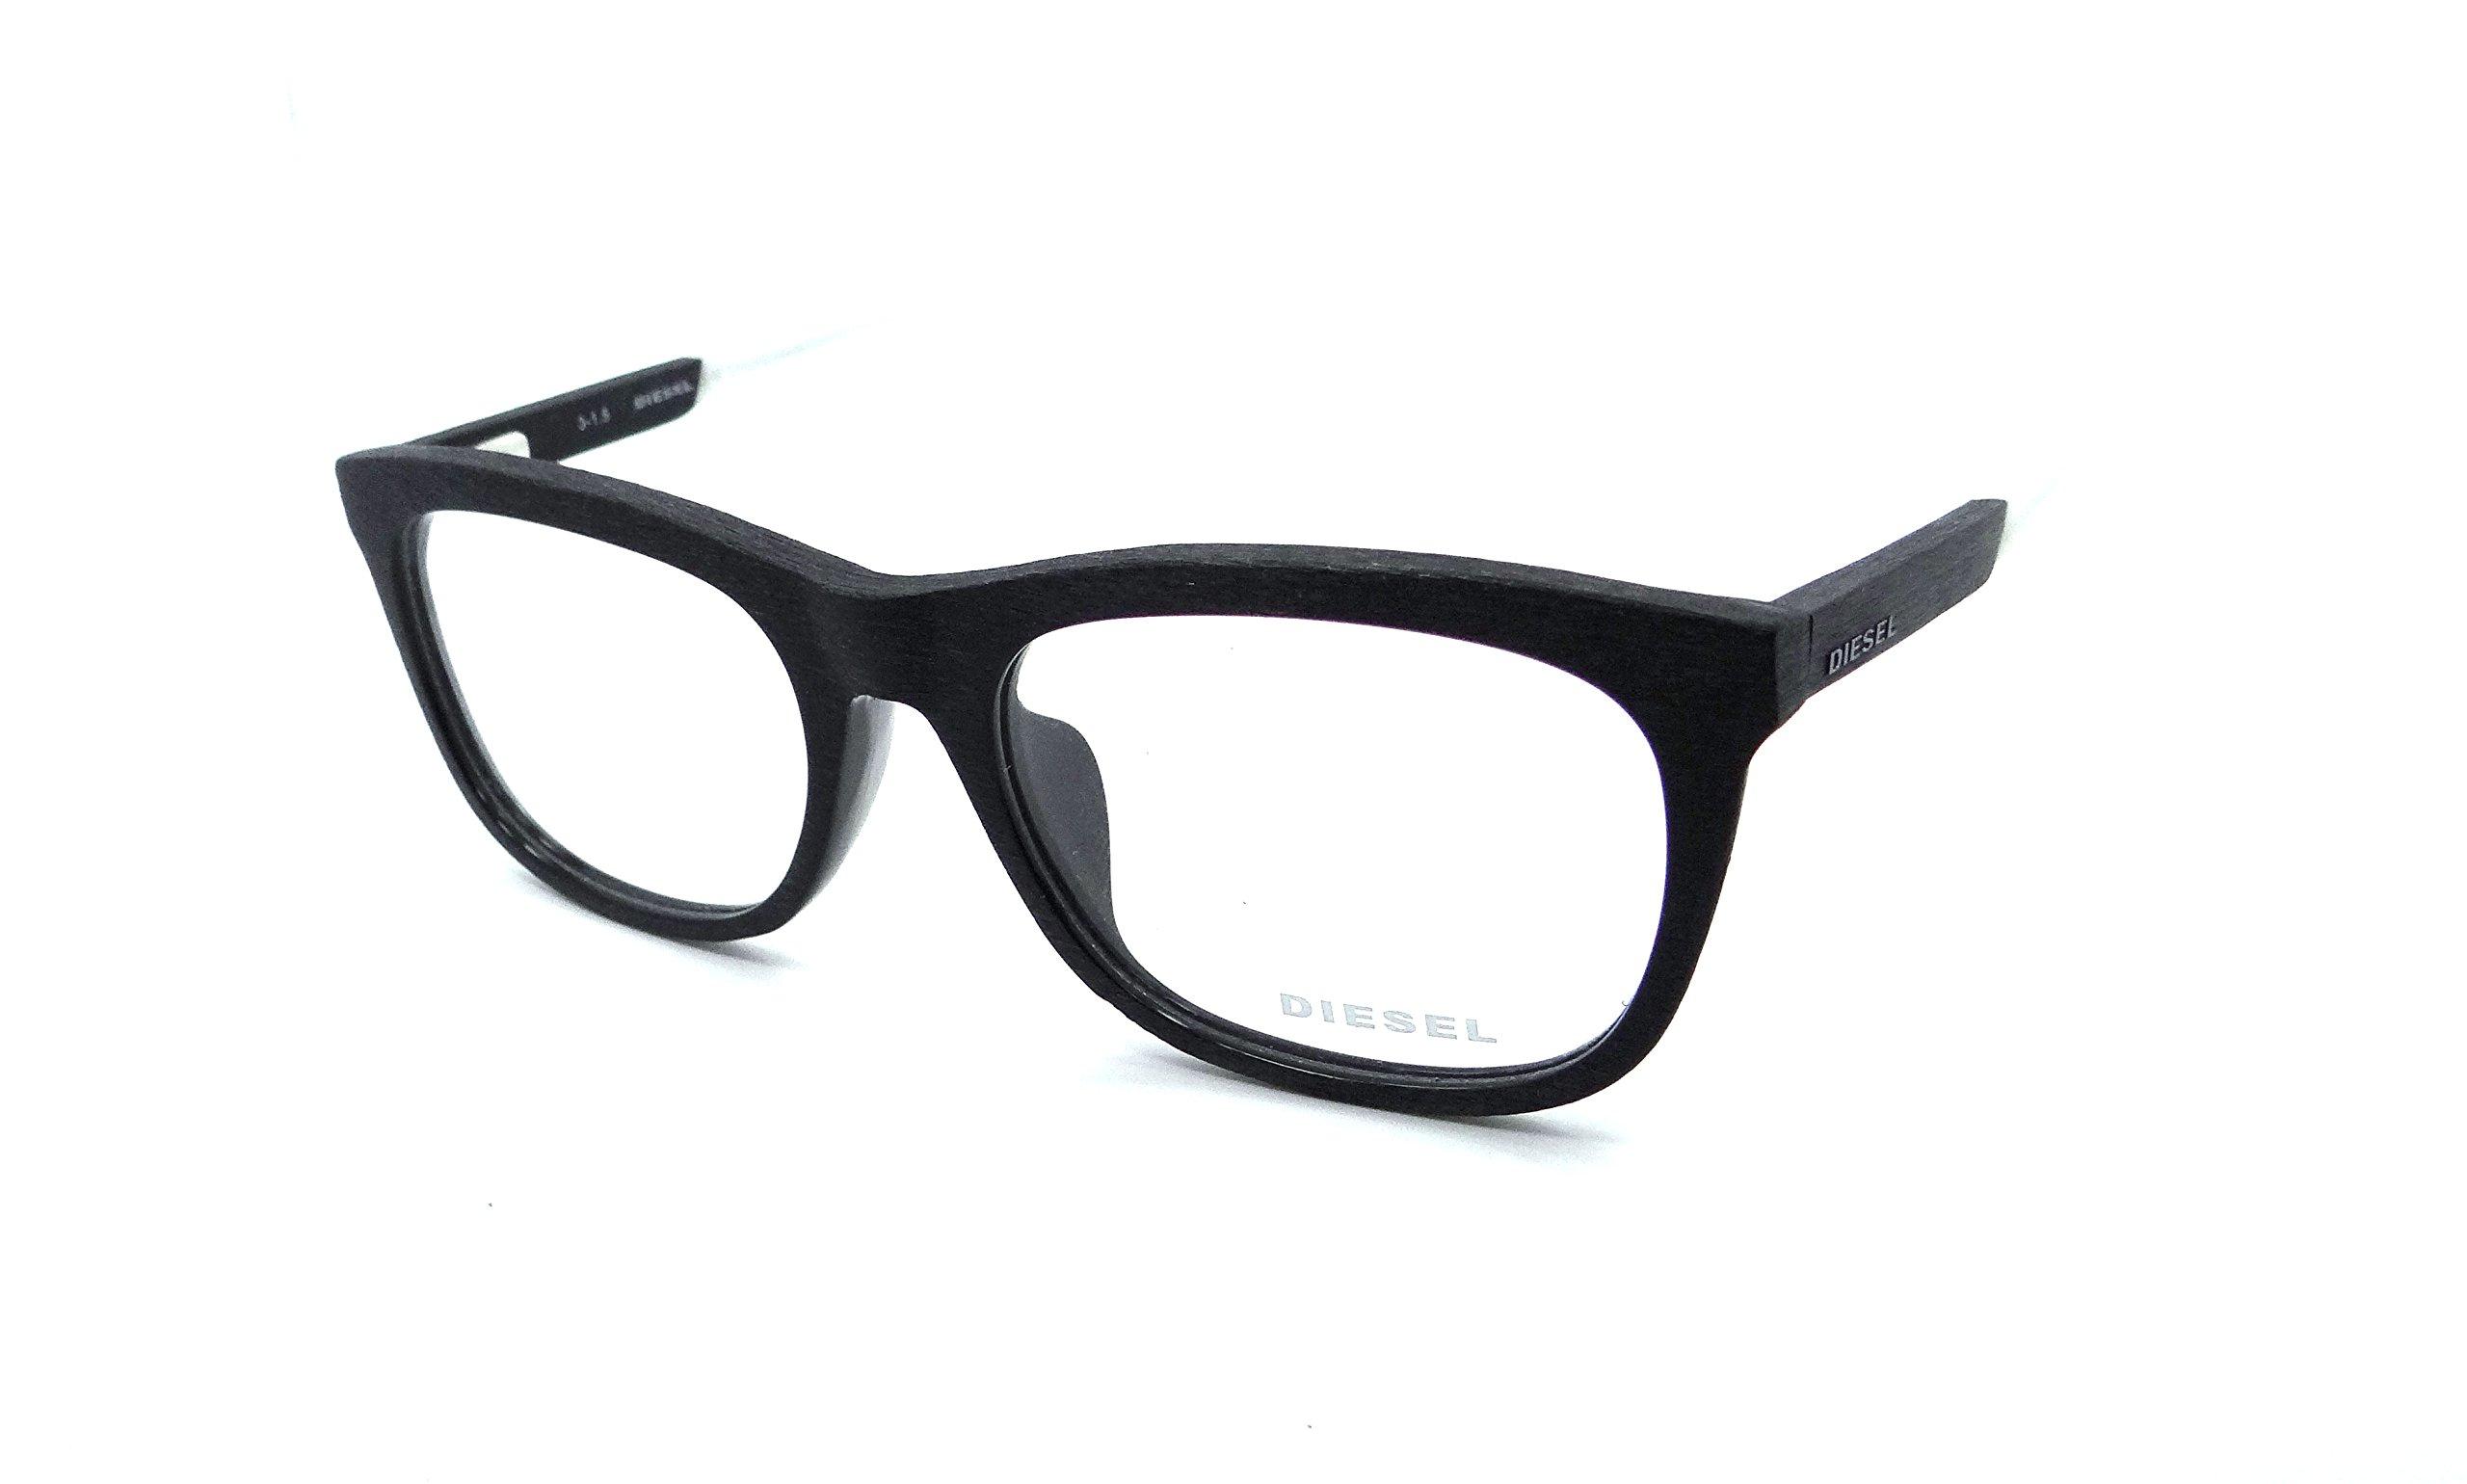 Diesel Rx Eyeglasses Frames DL5134-F 005 57-19-150 Black / White Wood Asian Fit